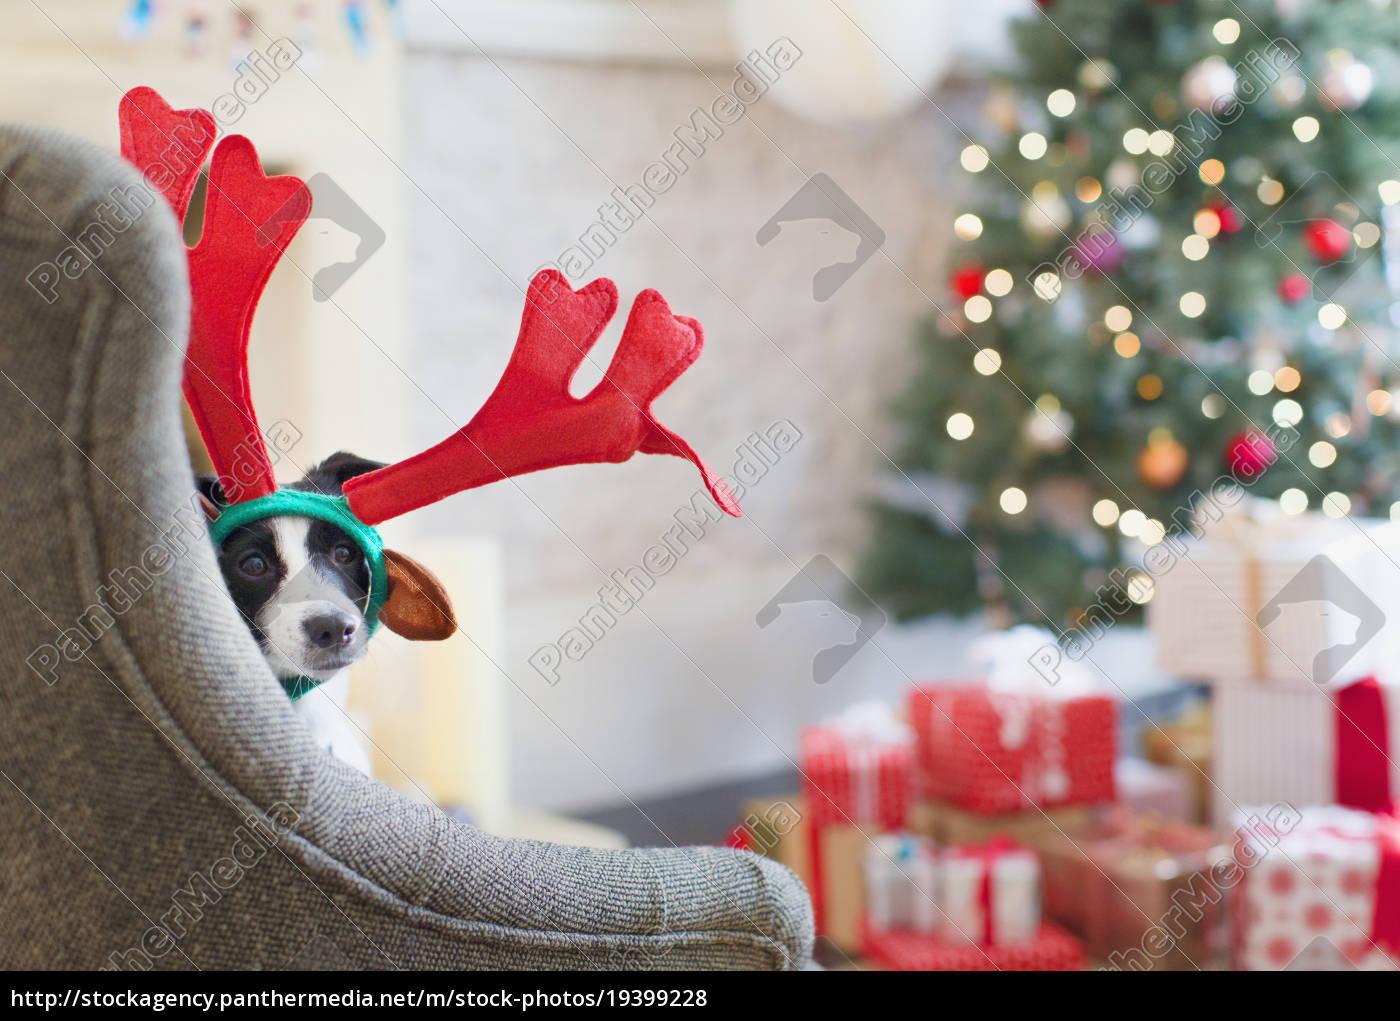 portrait, dog, wearing, reindeer, antlers, near - 19399228